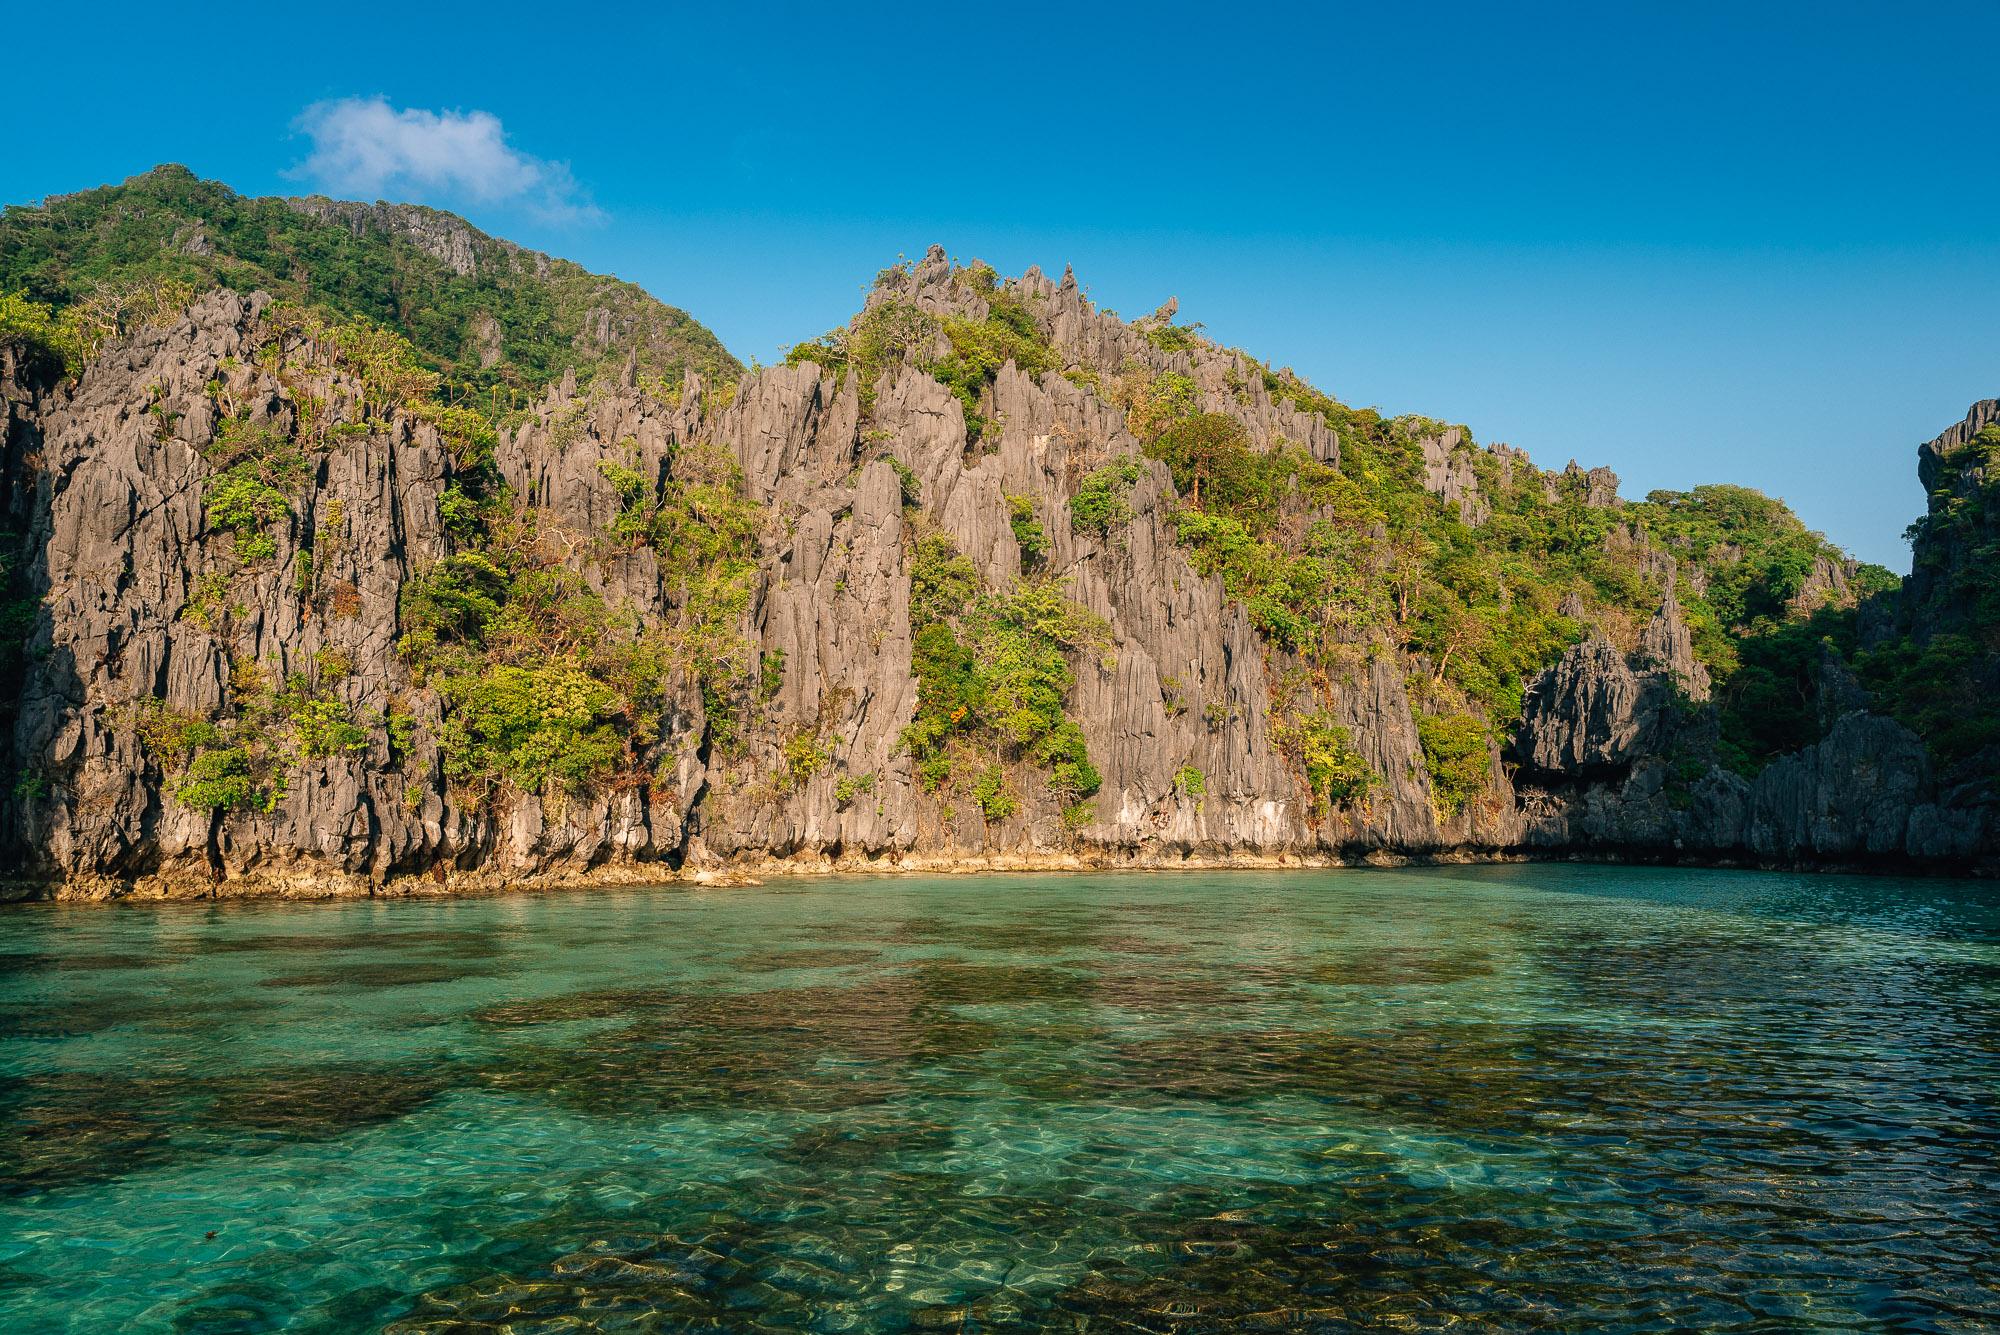 philippines_web-214.jpg